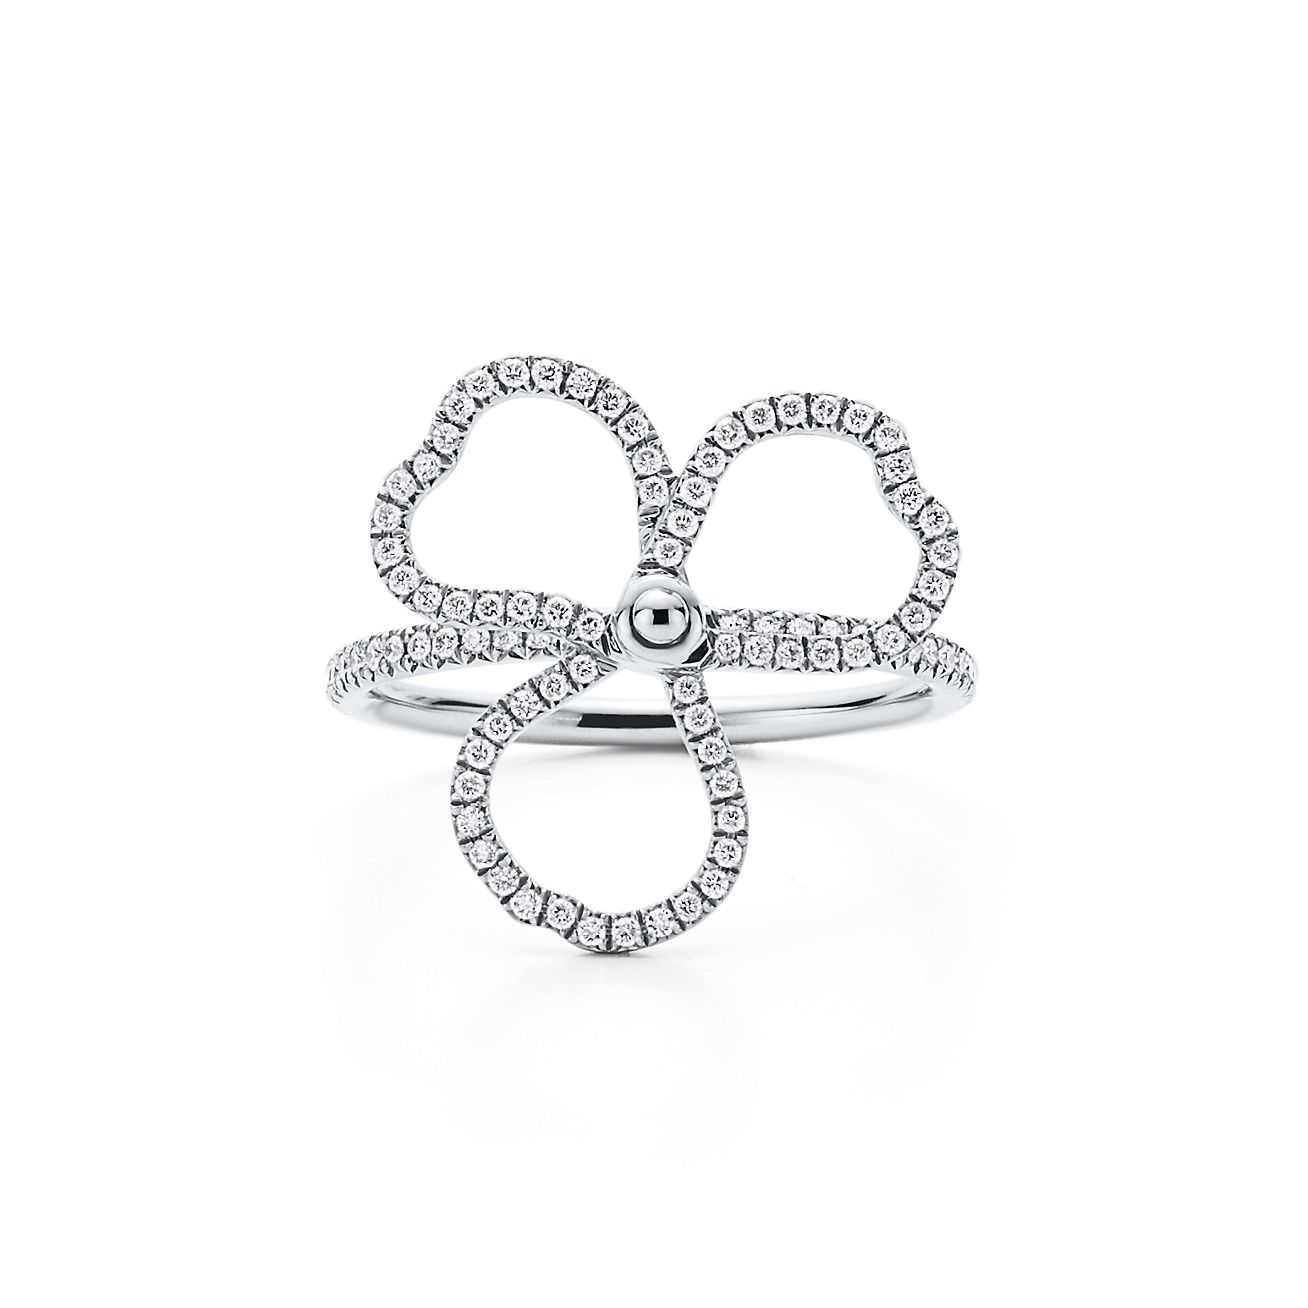 Tiffany Paper Flowers Ring Mit Offener Diamantblte In Platin